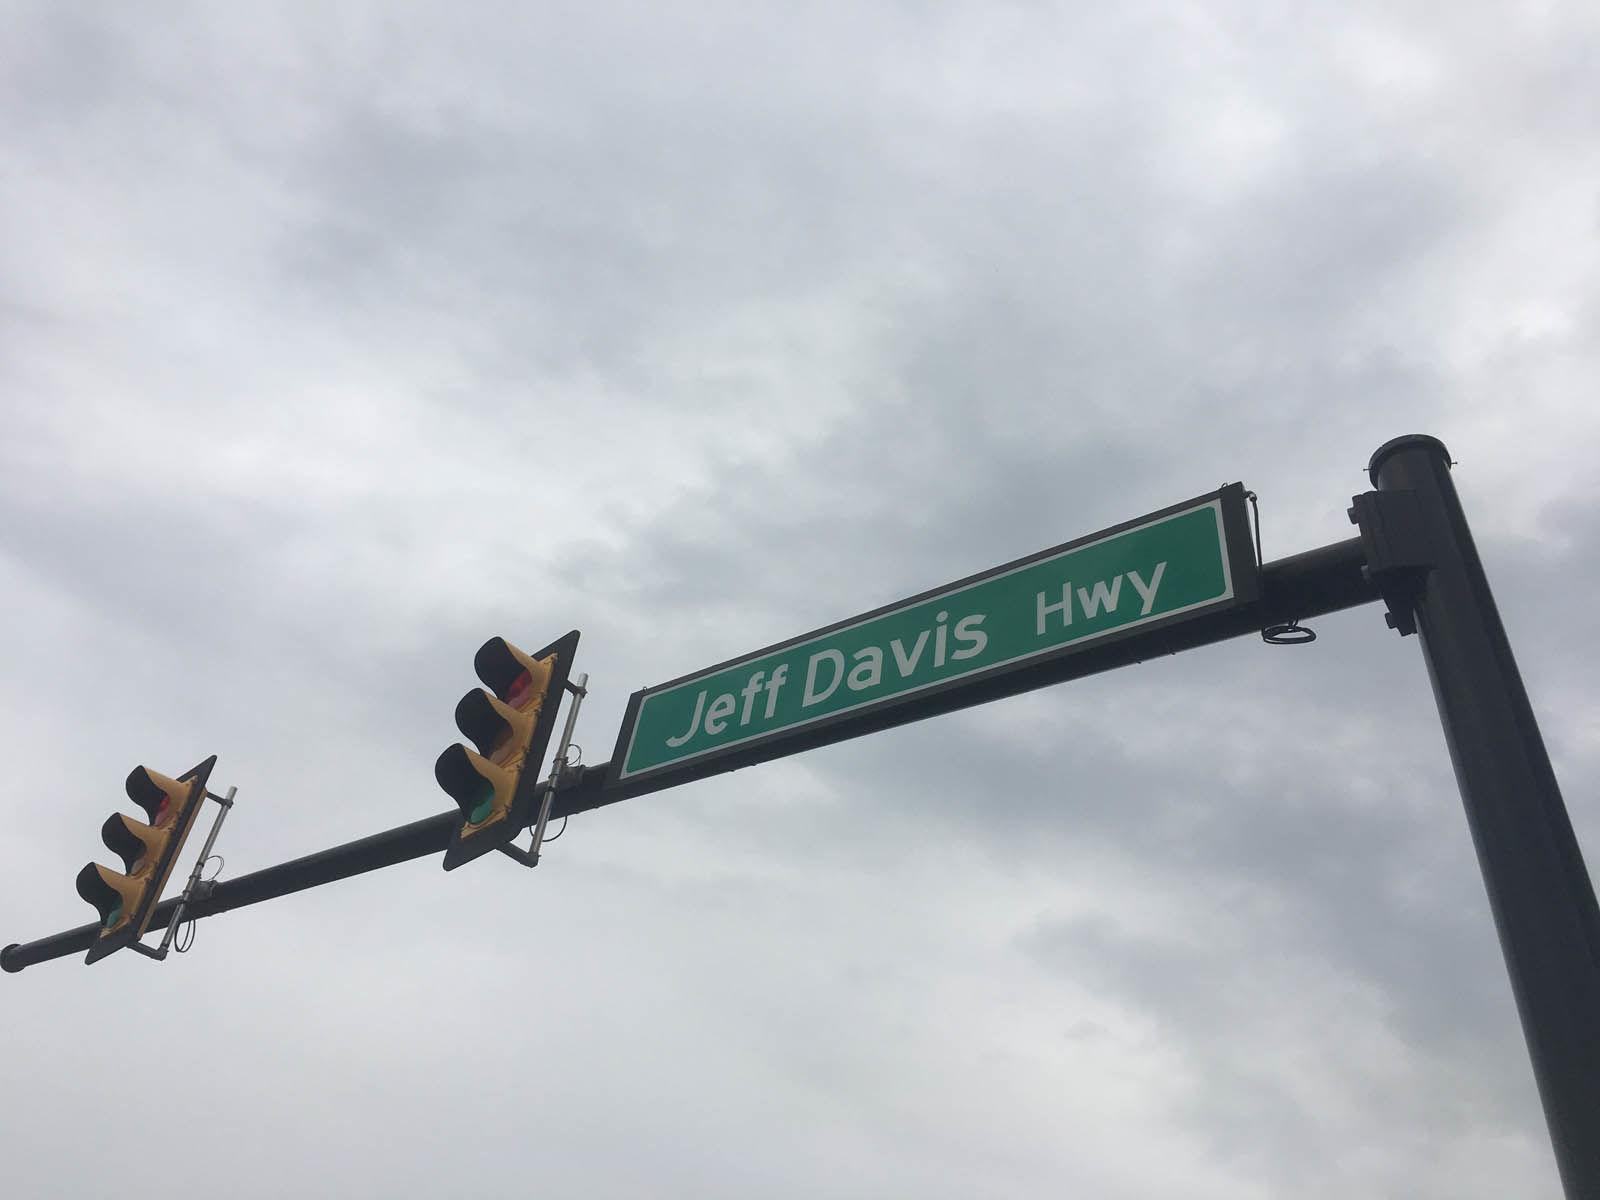 Road sign Jefferson Davis Highway